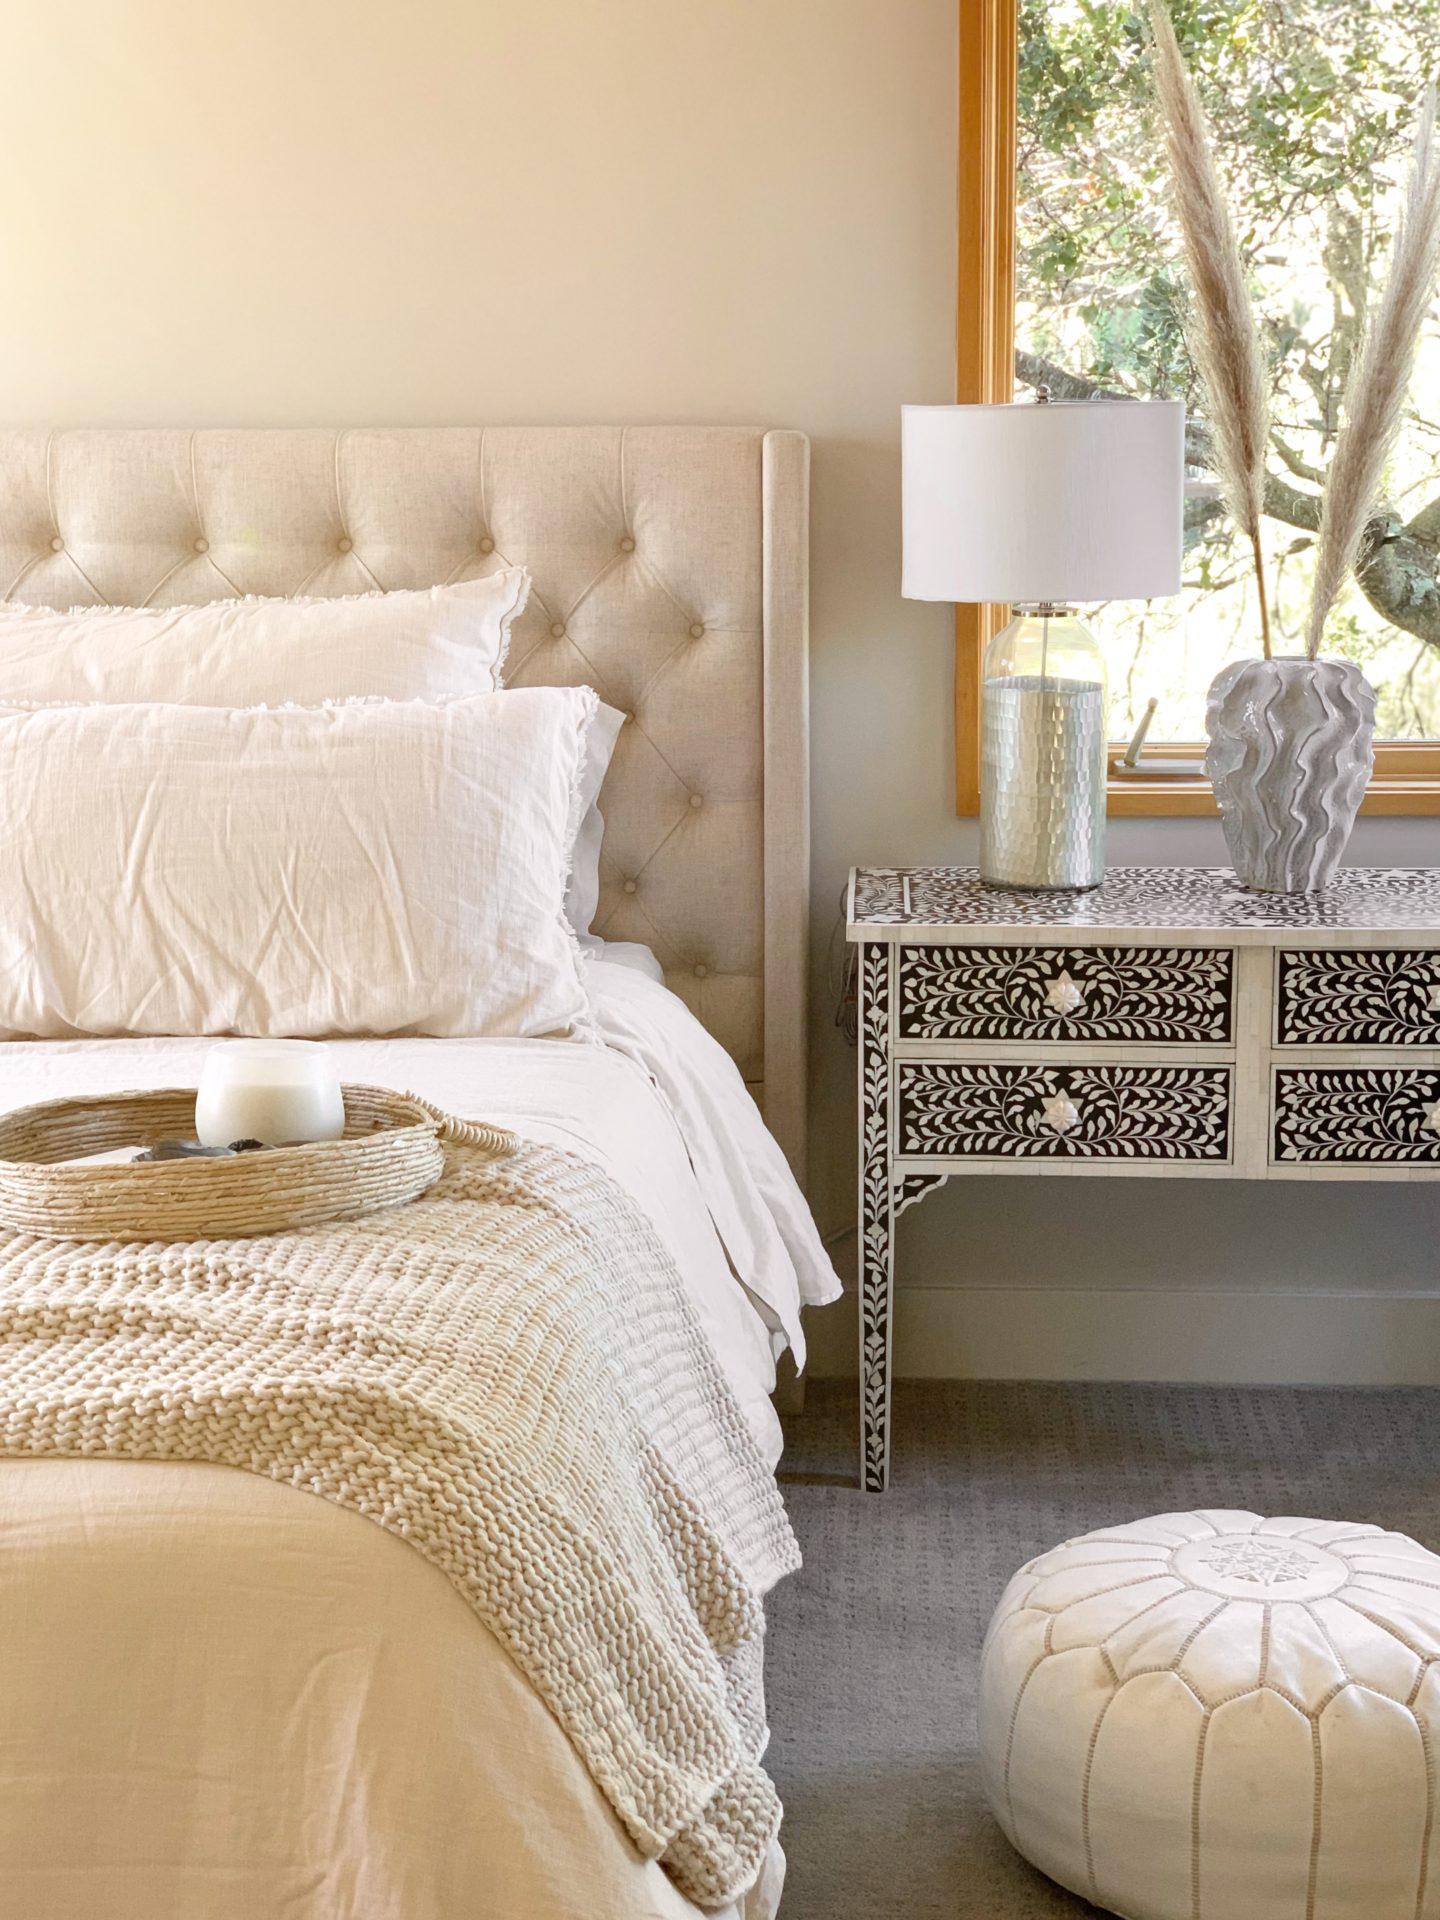 casaluna bedding | Casaluna Bedding by popular San Francisco life and style blog, Just Add Glam: image of a bed with neutral color Casaluna bedding on it.